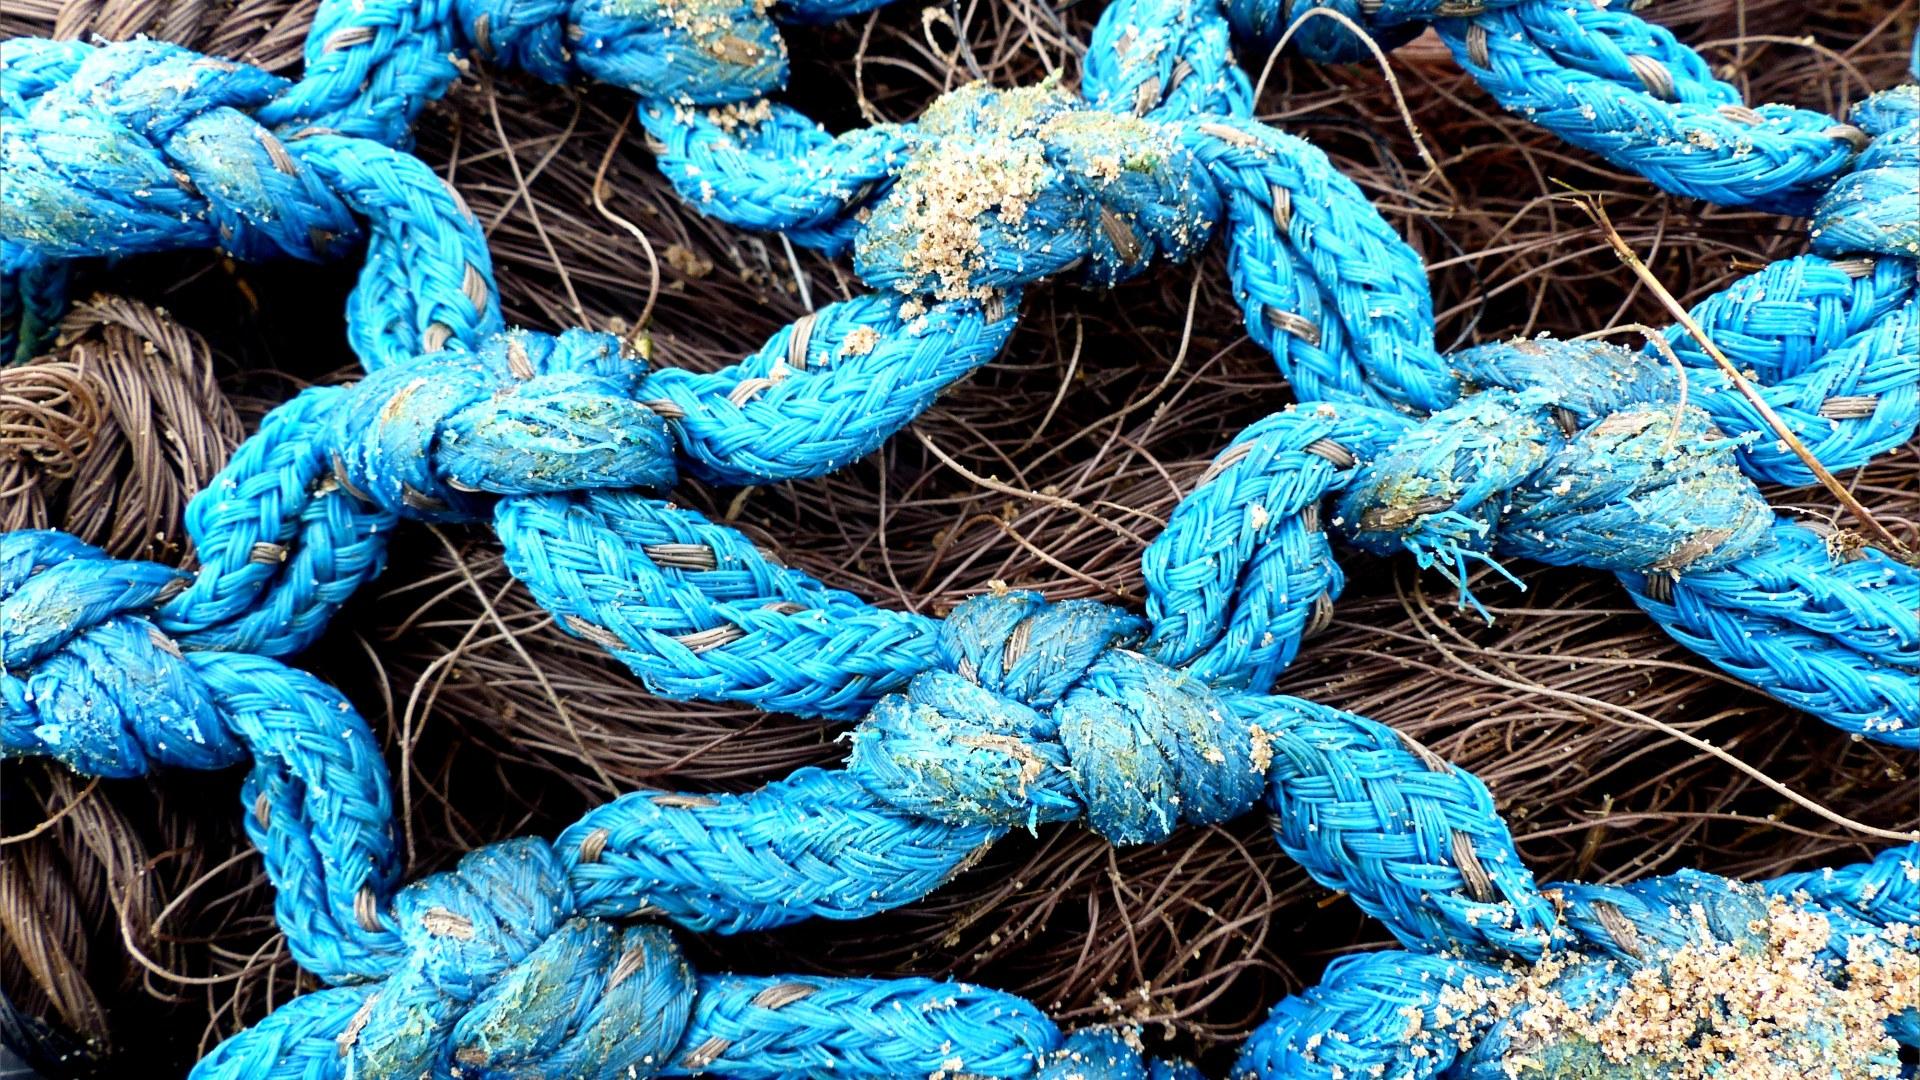 Fishing net washed up as flotsam on the beach